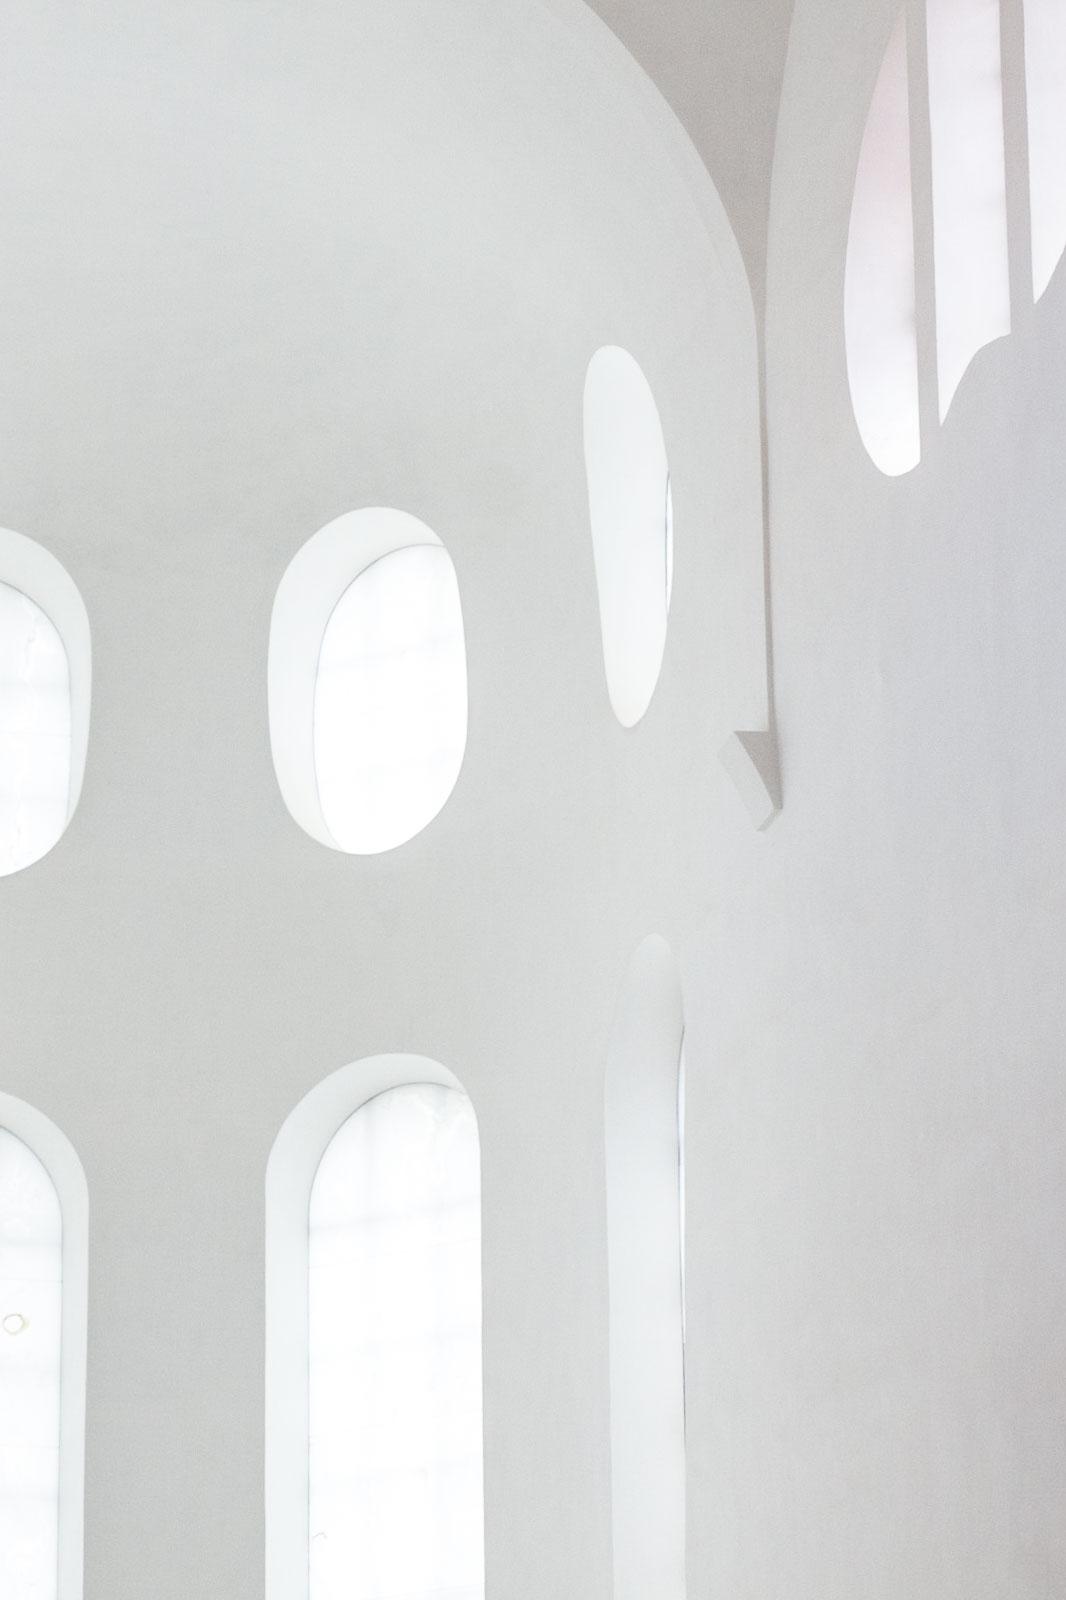 Moritzkirche-Augsburg-Andreas-Fuhrmann-0003